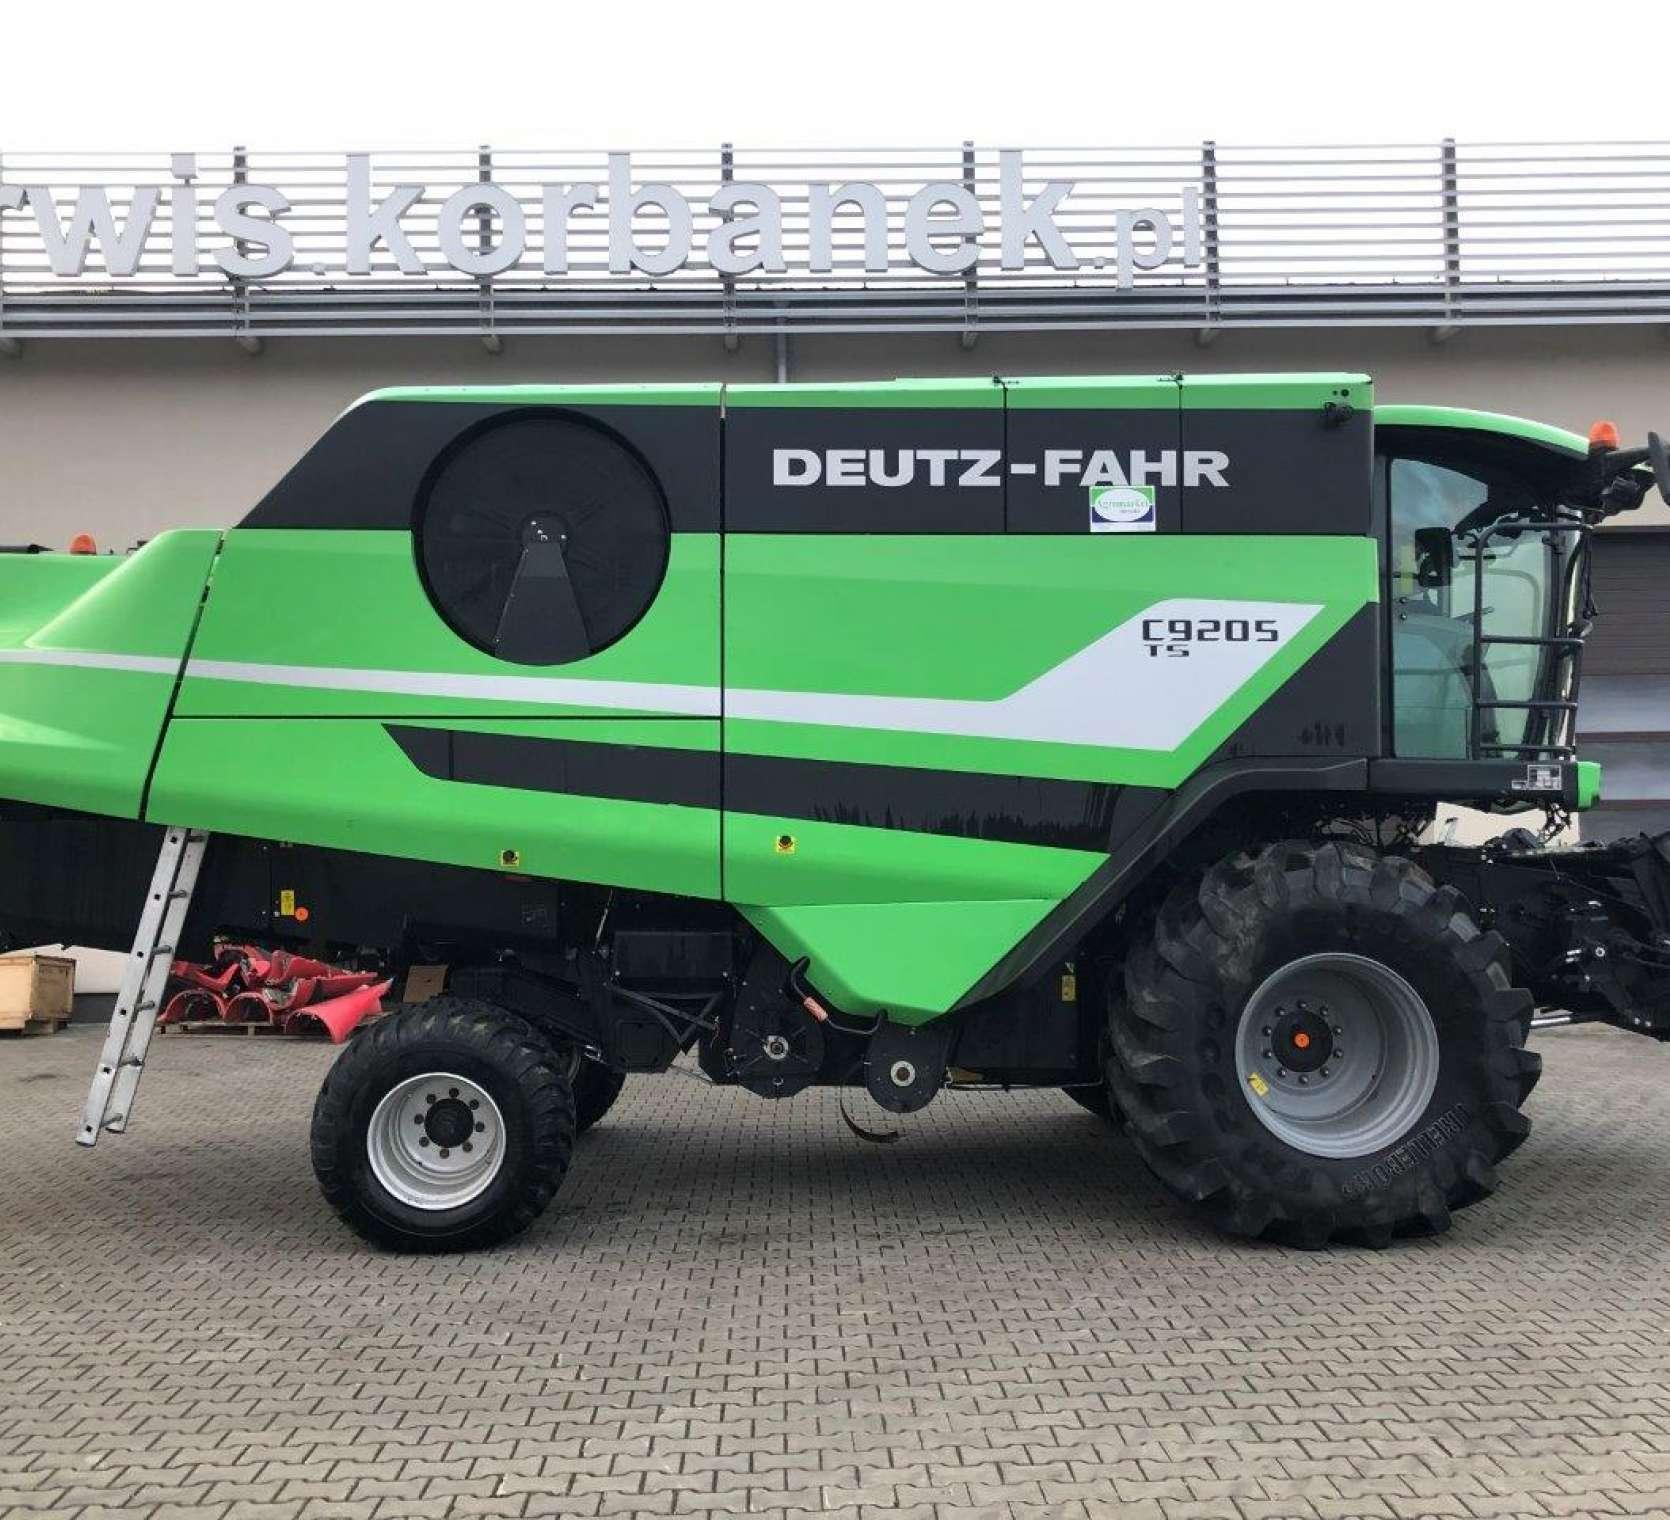 Deutz Fahr C9205TS prawy bok